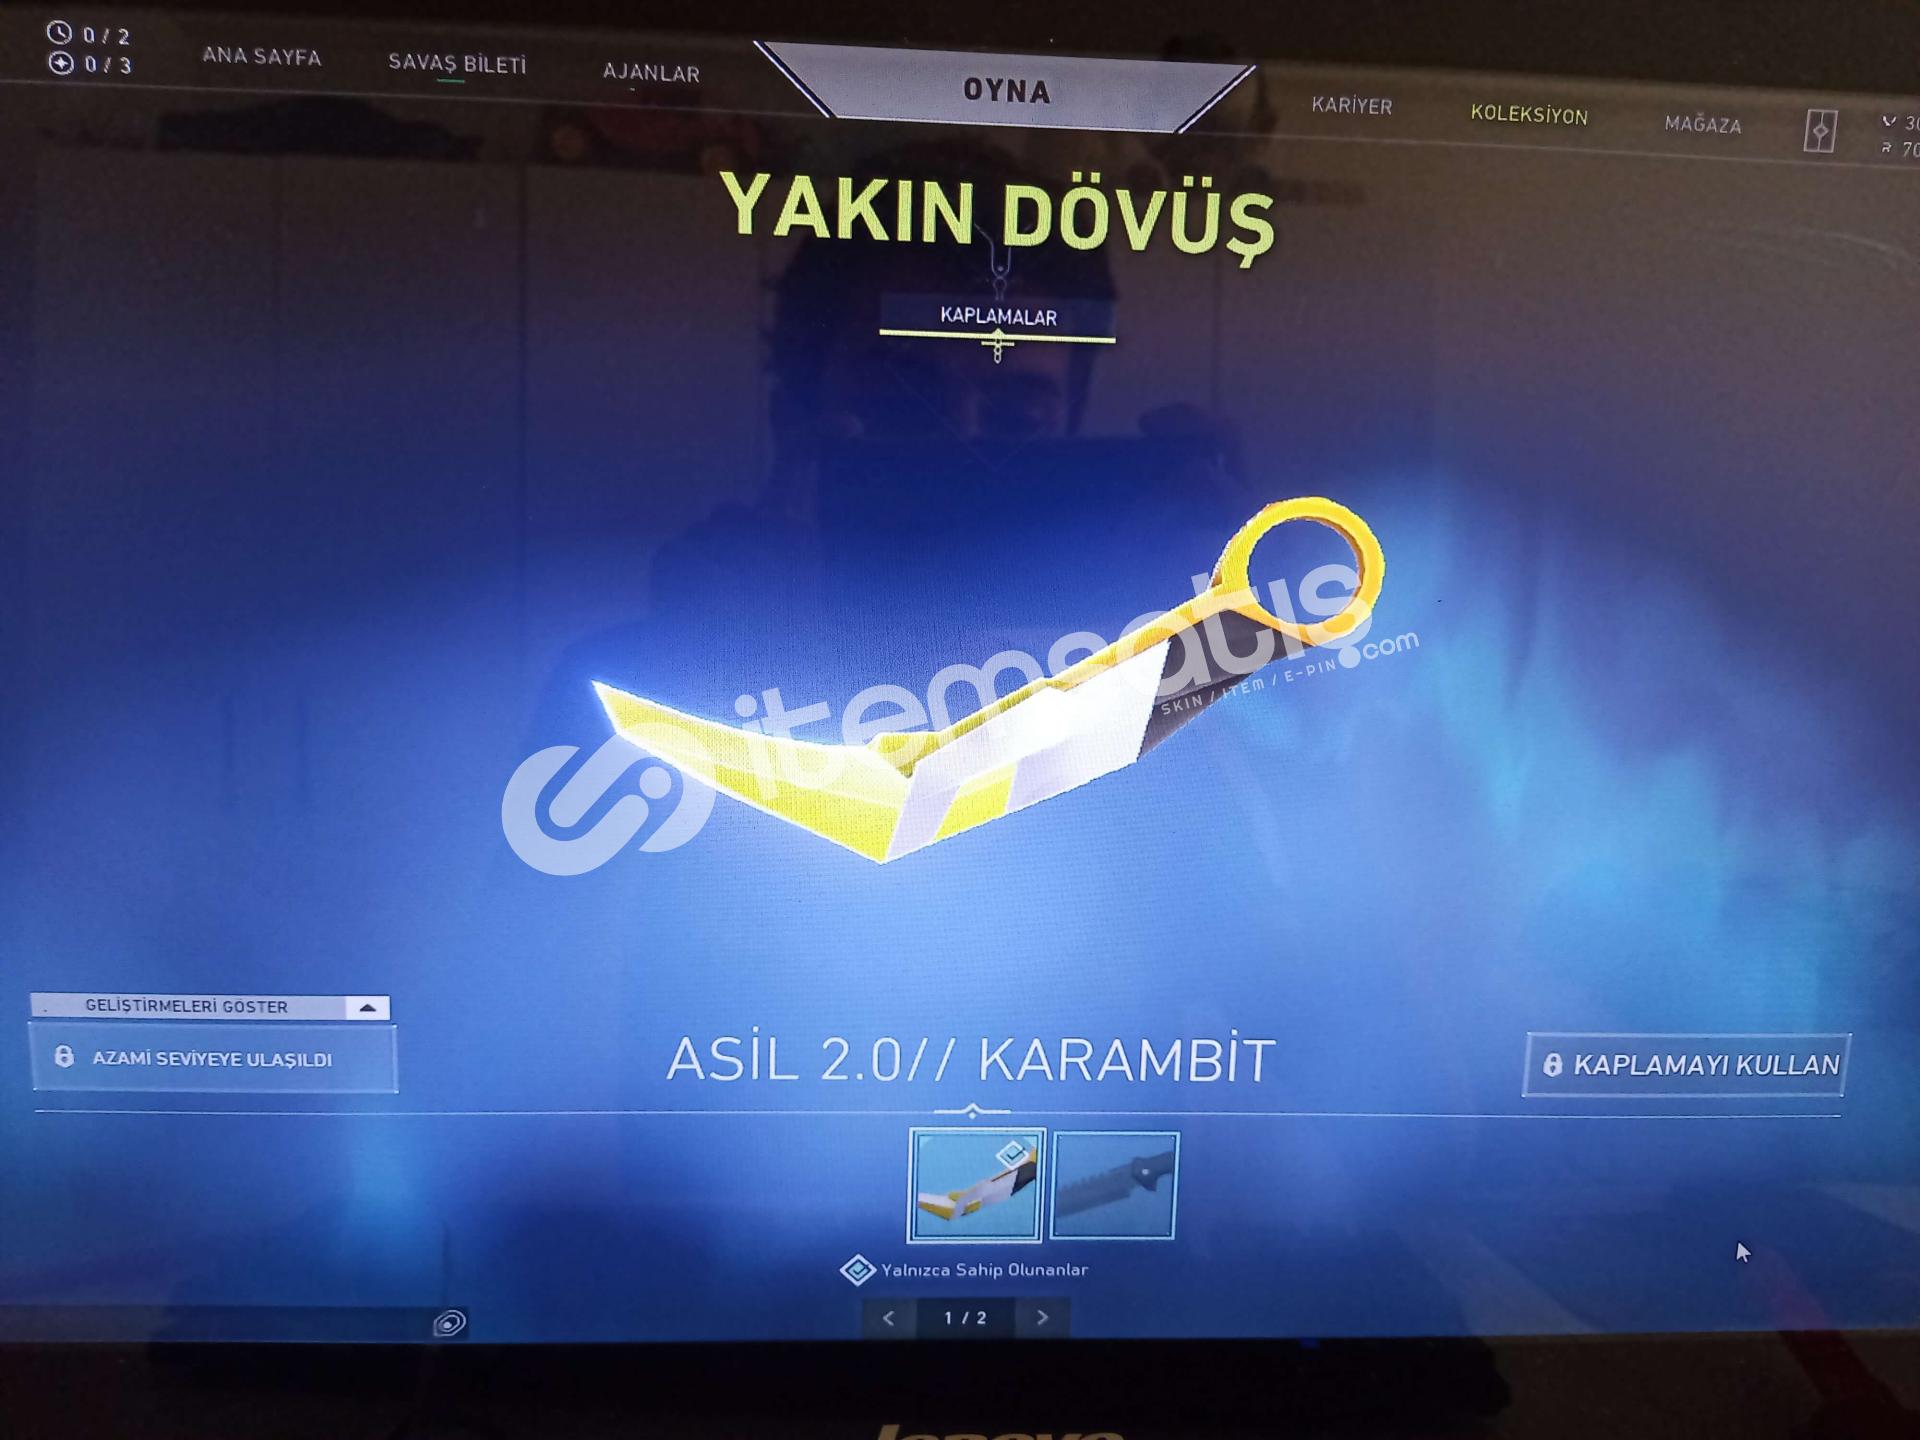 Kurucu Mailli Asil Karambit+Yeni Battle Pass